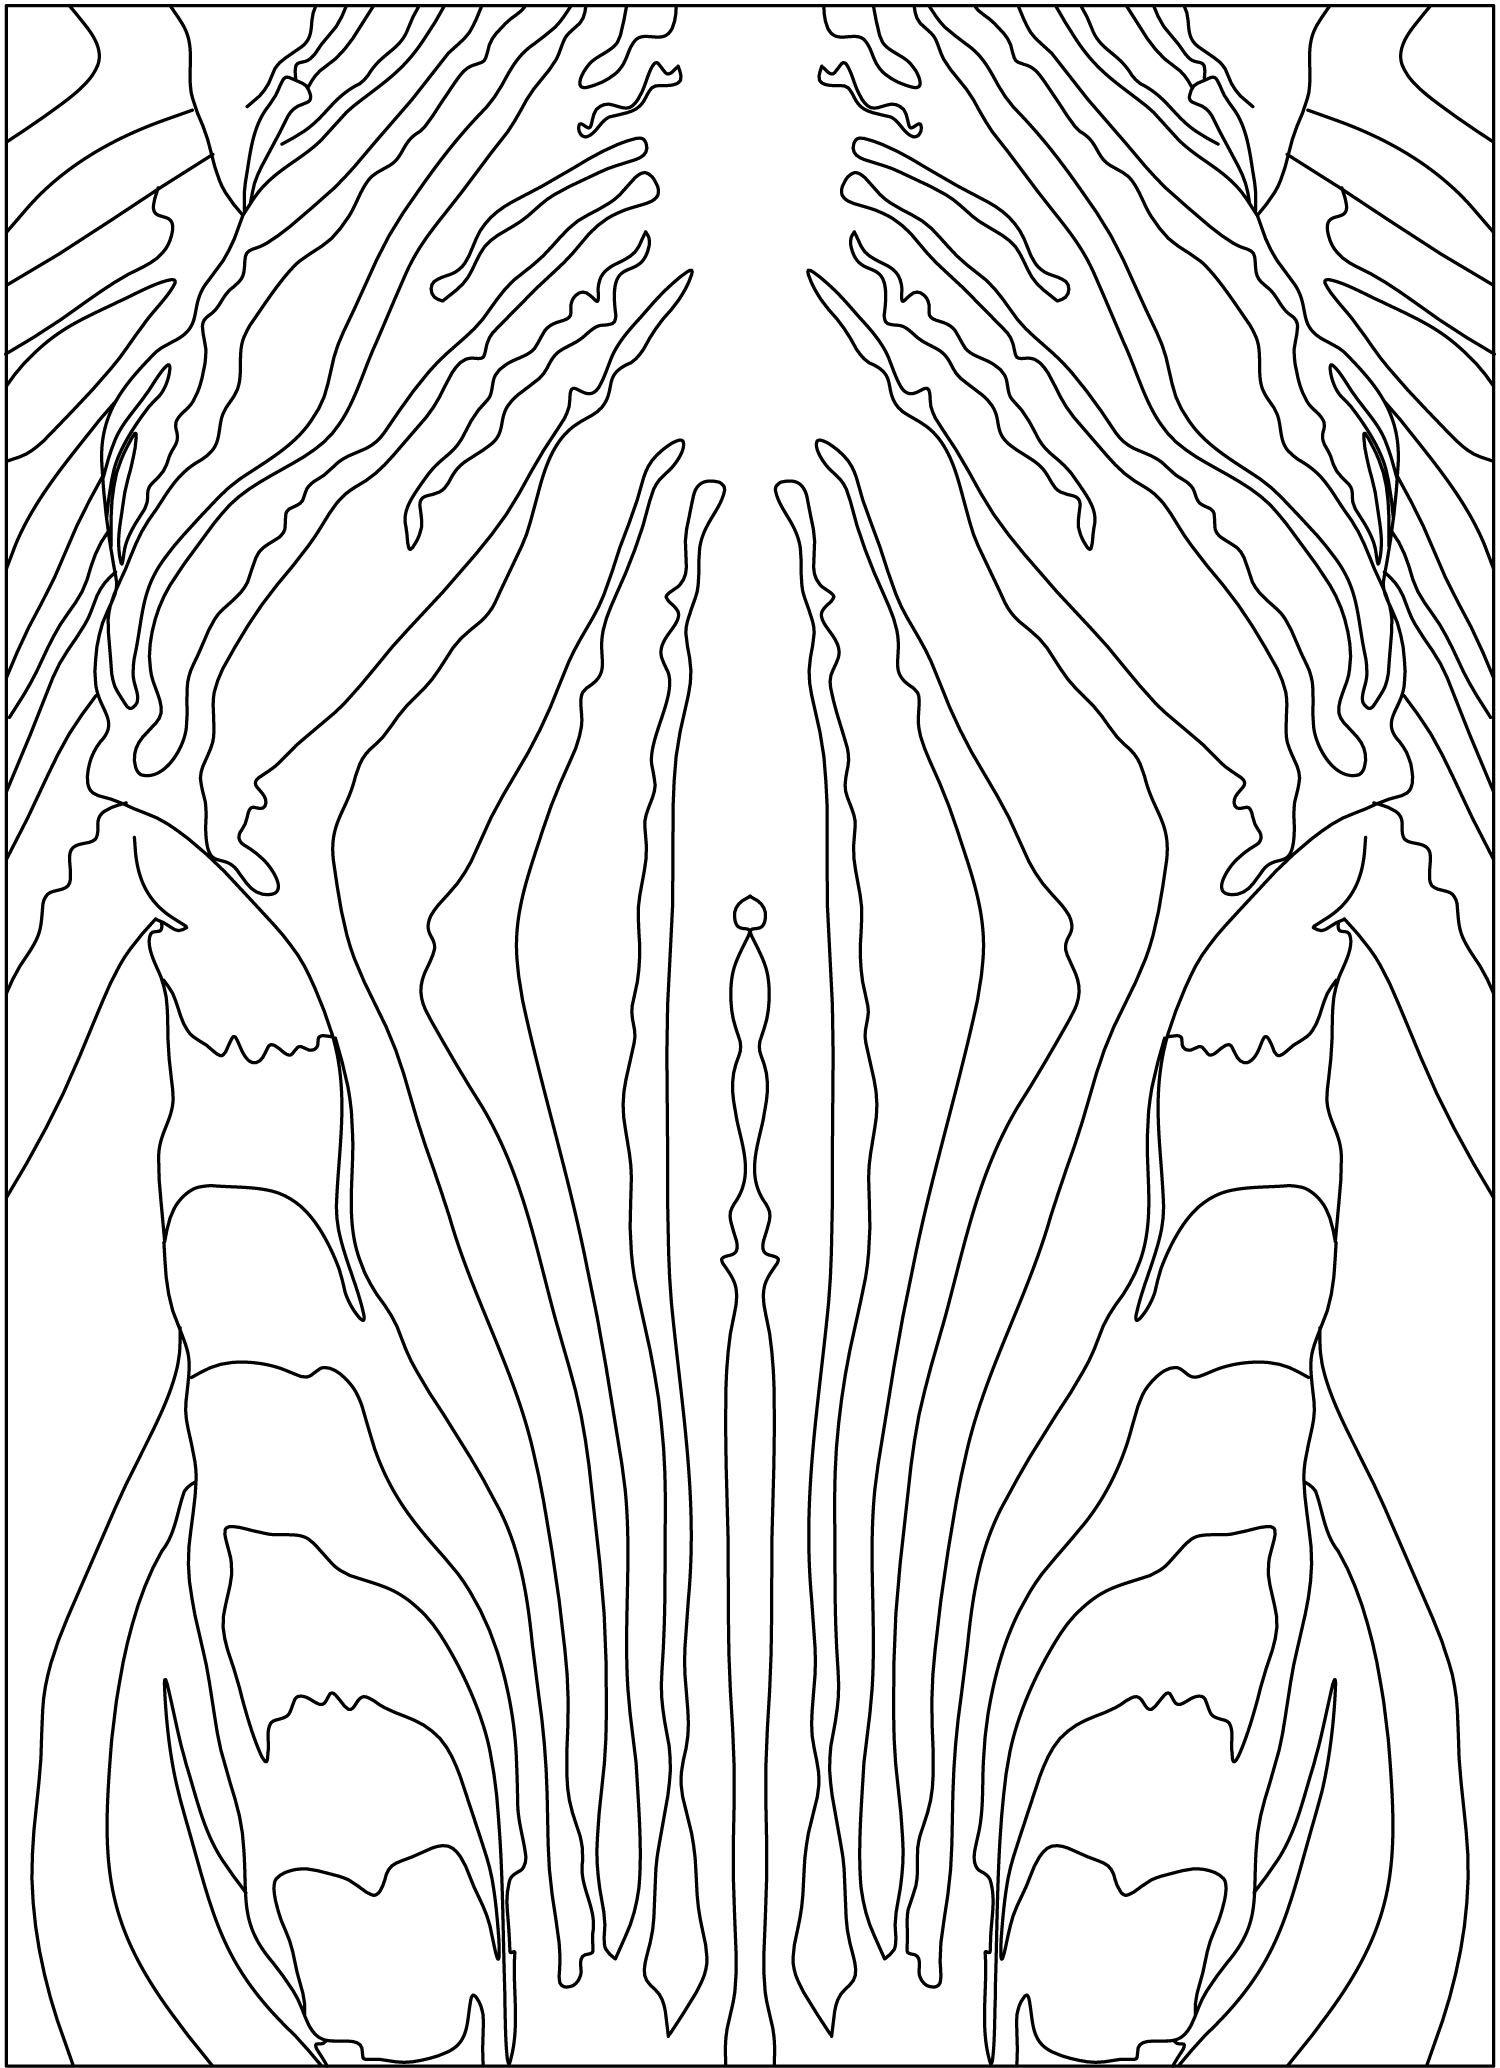 Autocad Drawing Of A Custom Zebra Rug Took Me Forever